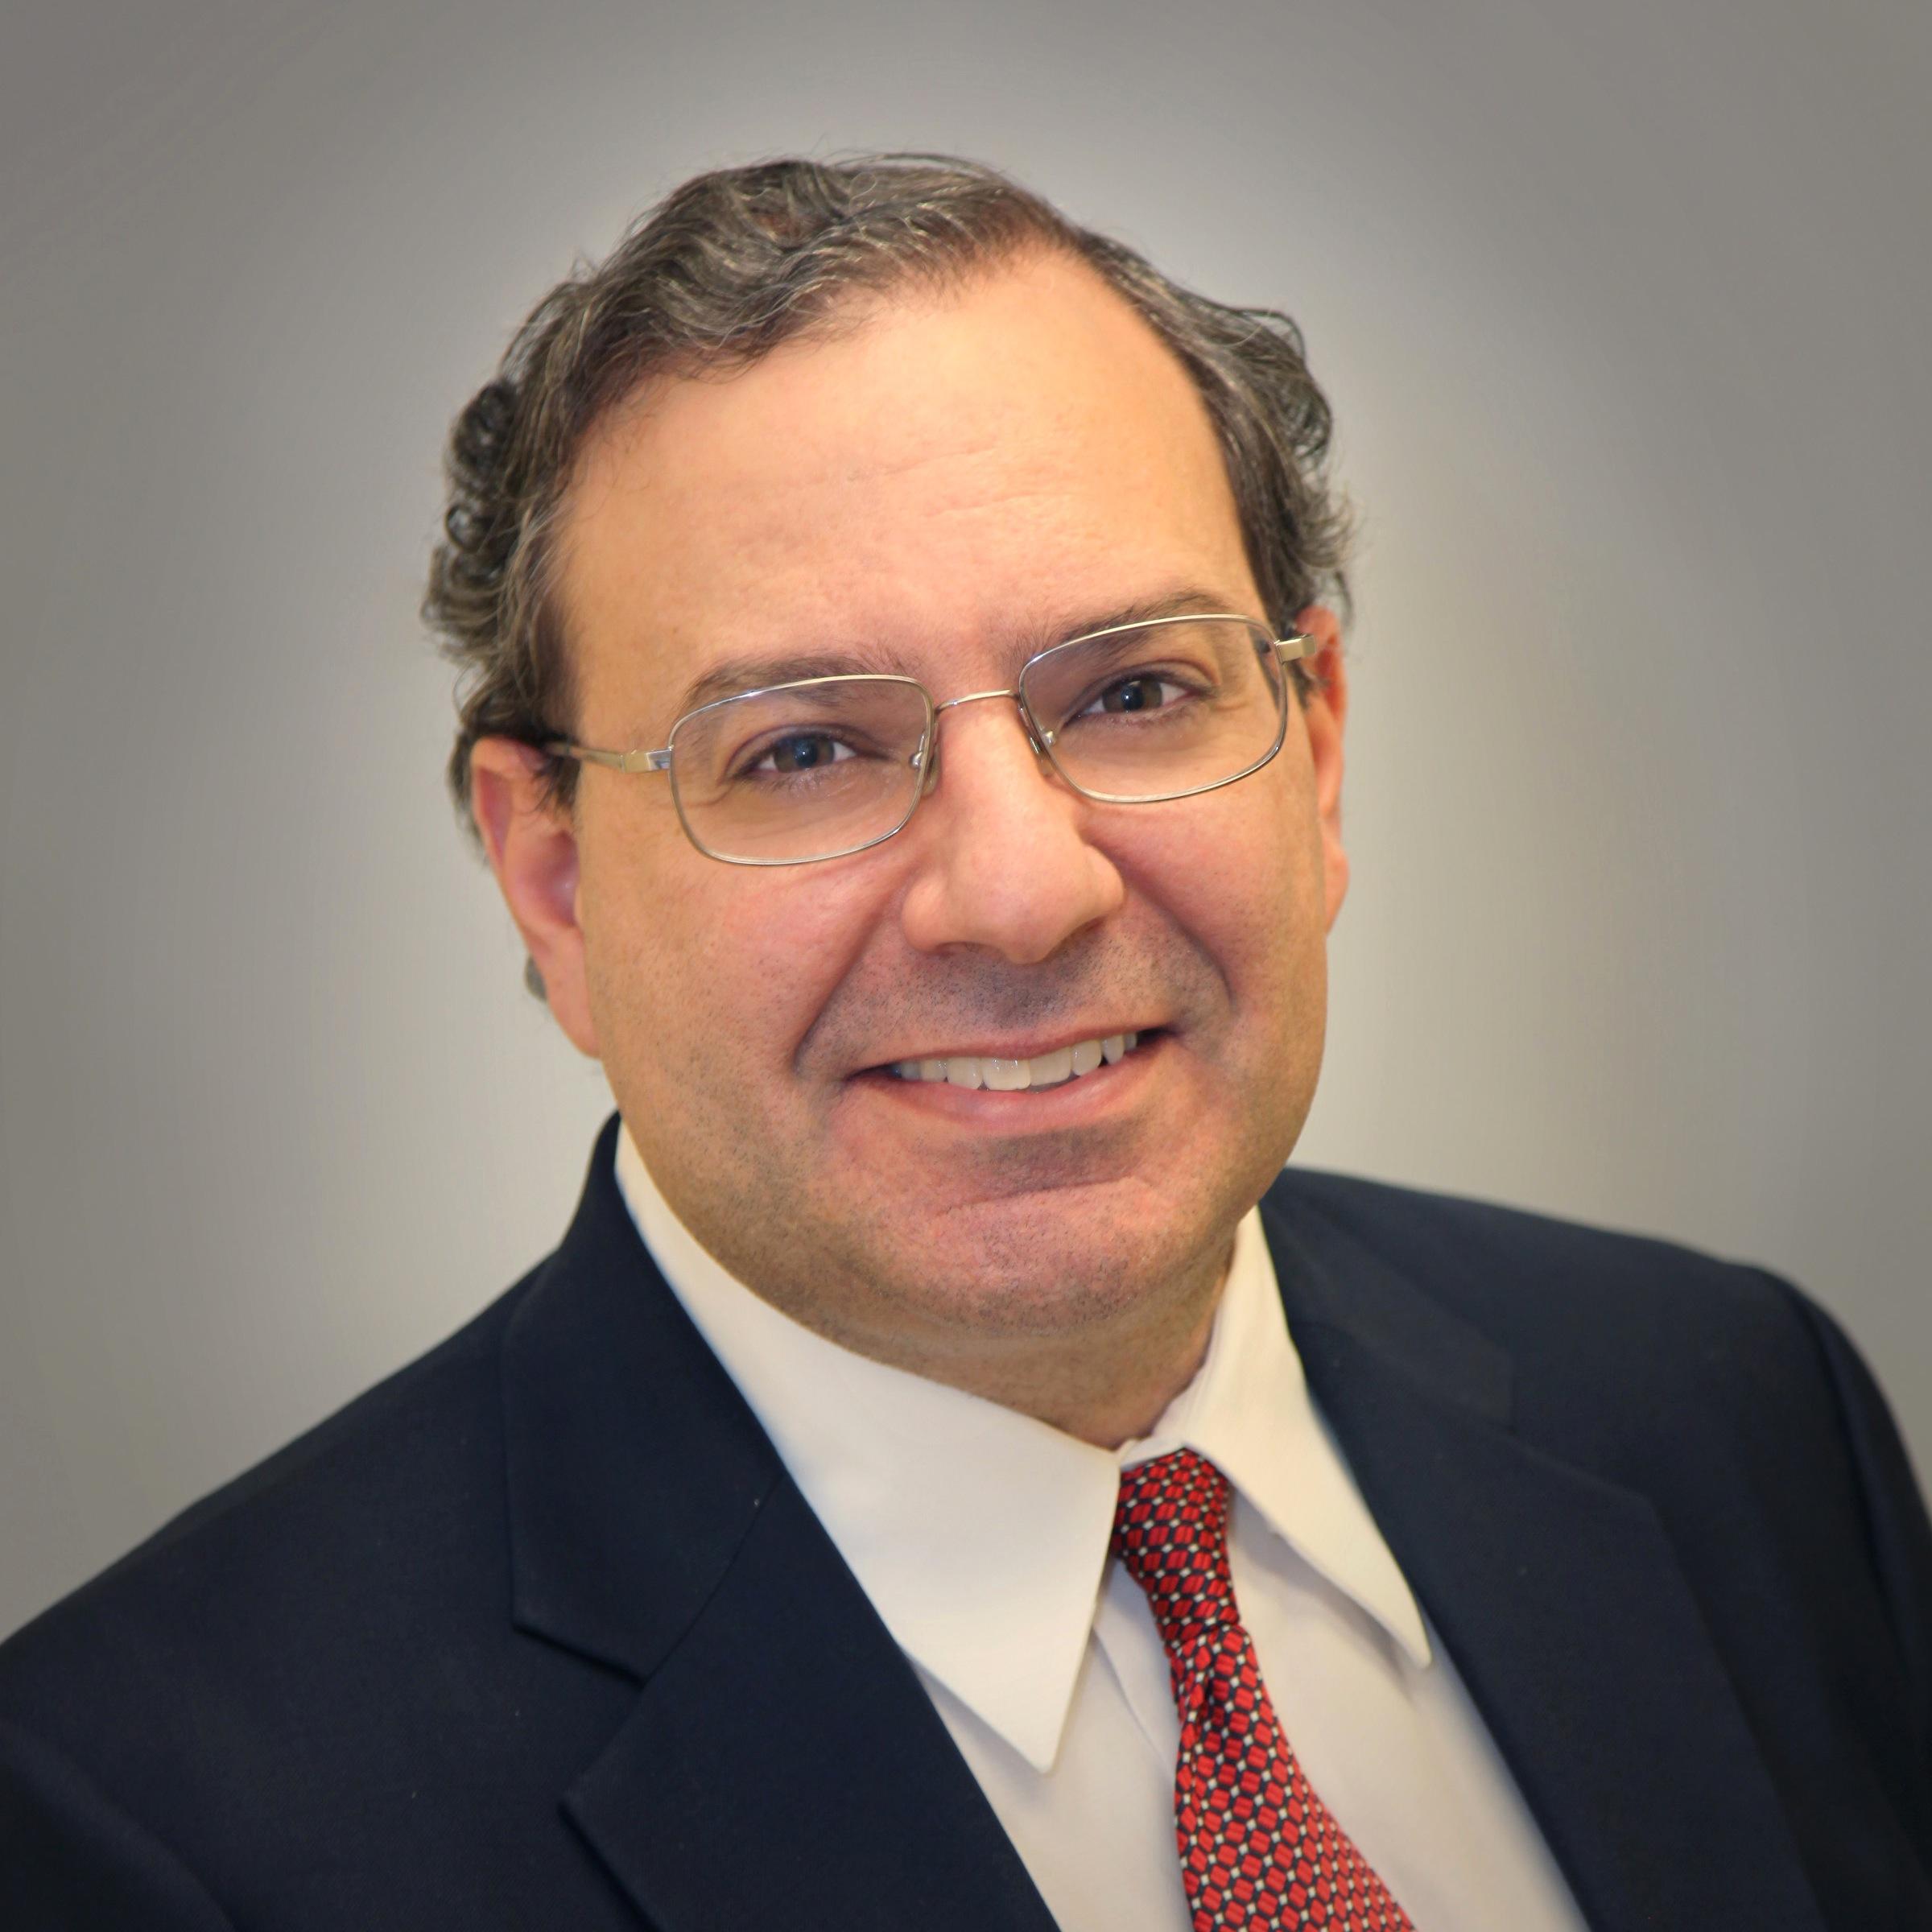 James Newman, MD, FACS